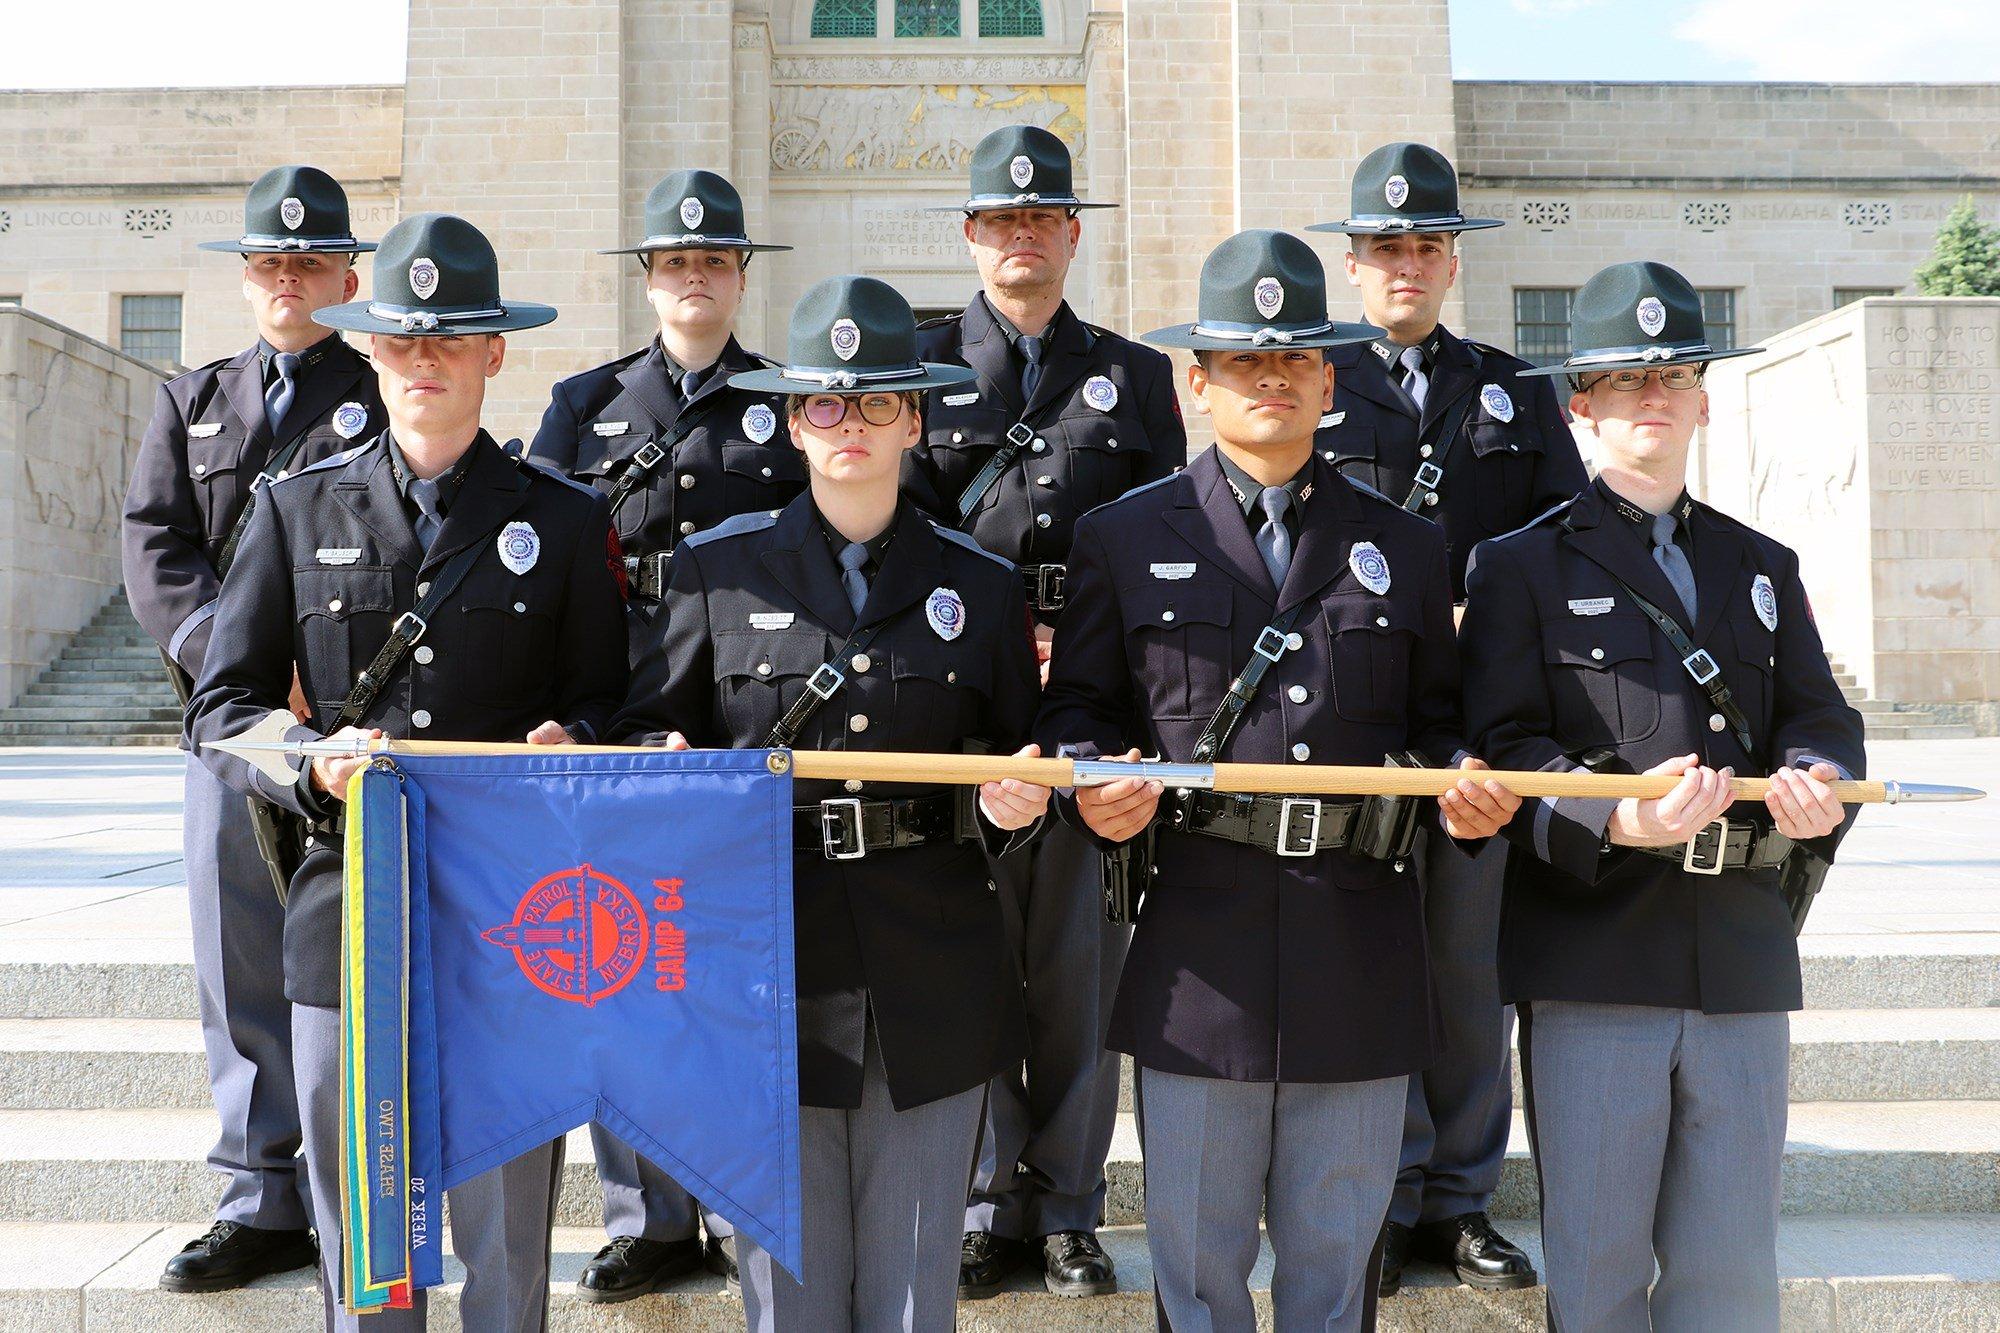 Nebraska State Patrol celebrates new class of graduates